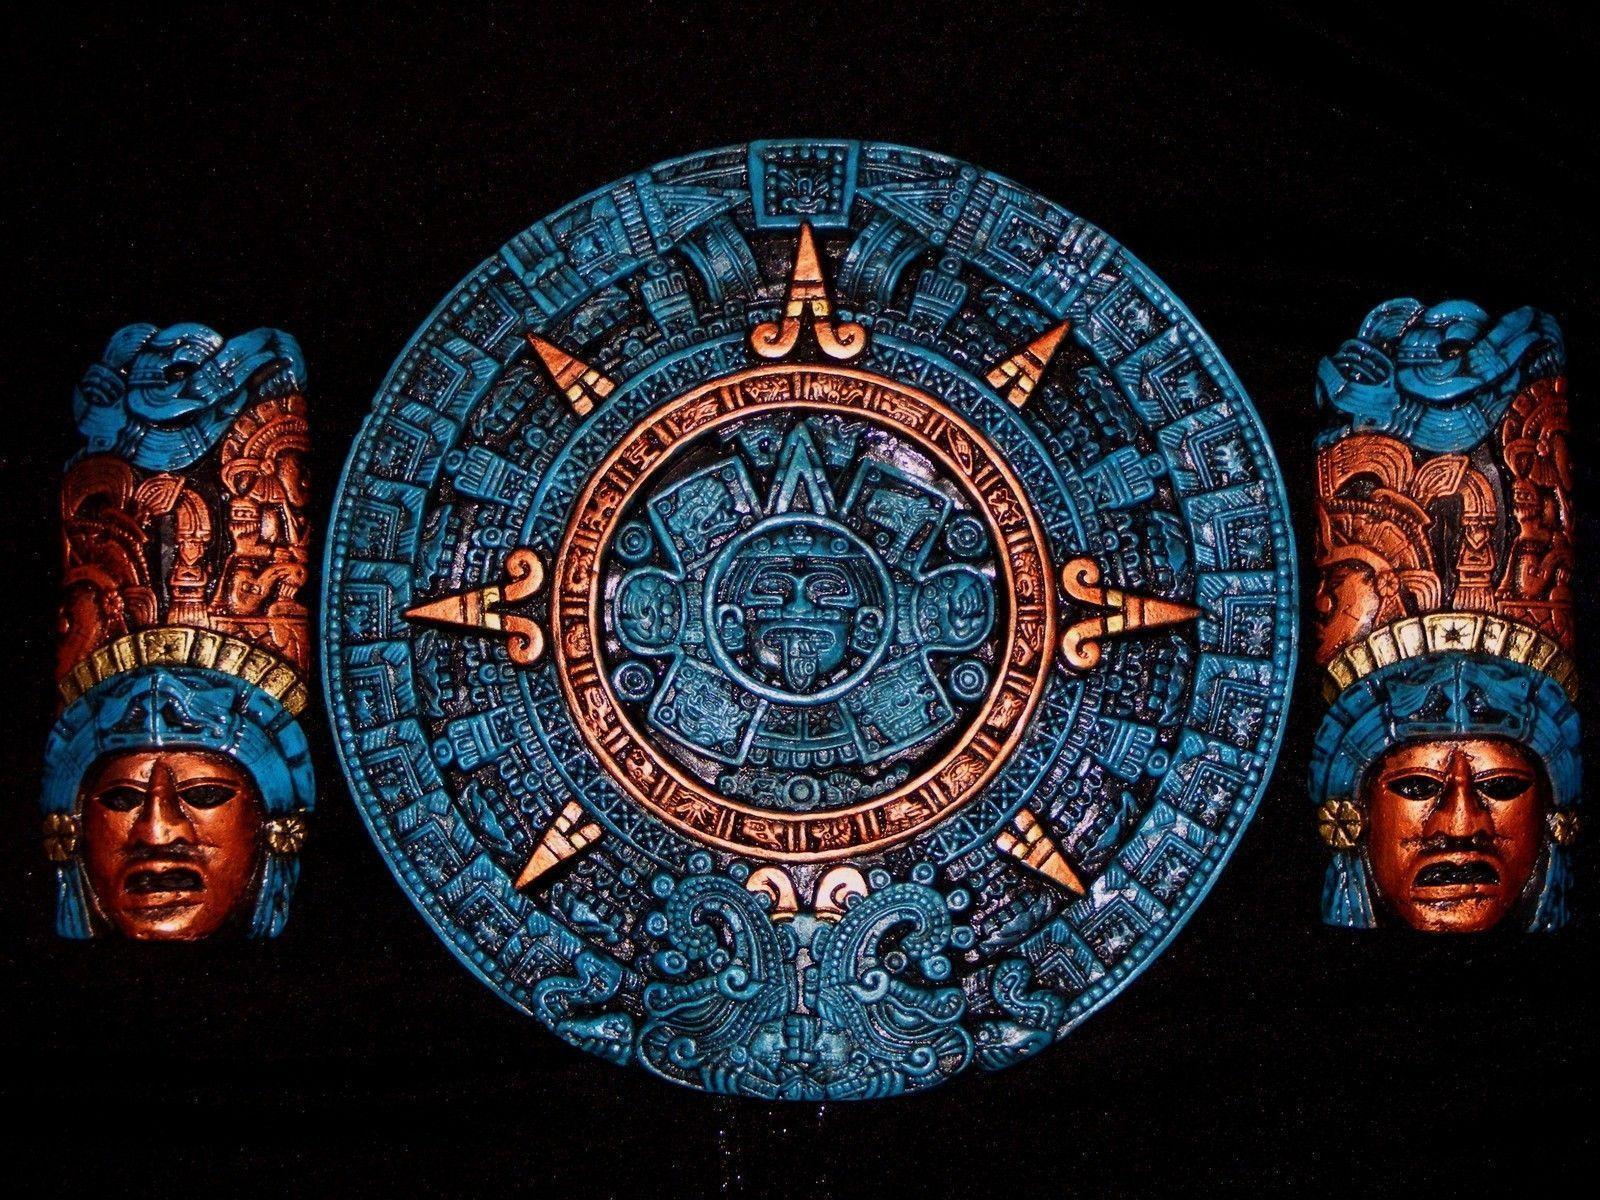 Wallpaper Of Calendar : Aztec calendar wallpapers wallpaper cave